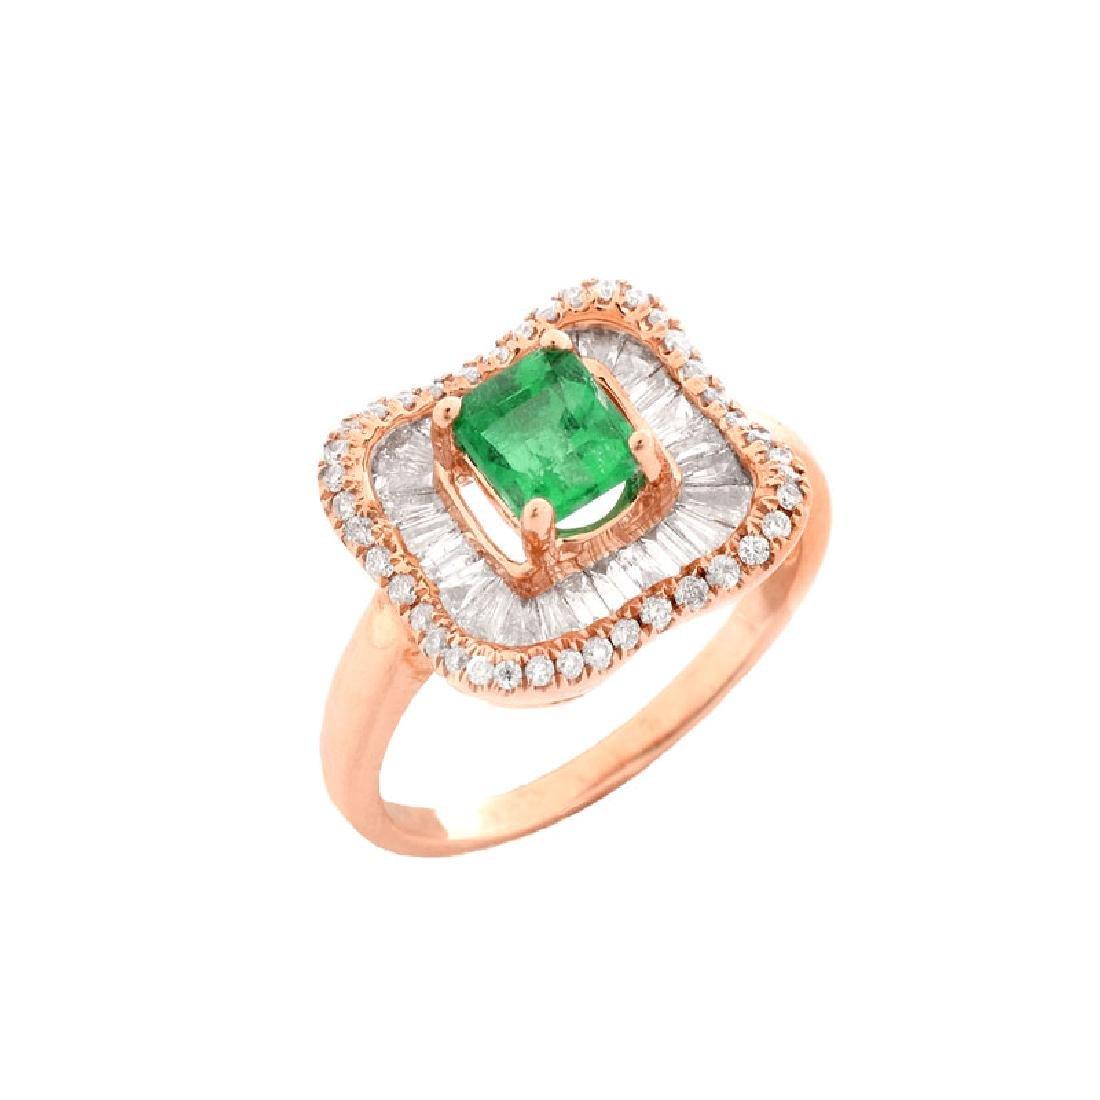 Approx. .75 Carat Colombian Emerald, 1.0 Carat Baguette